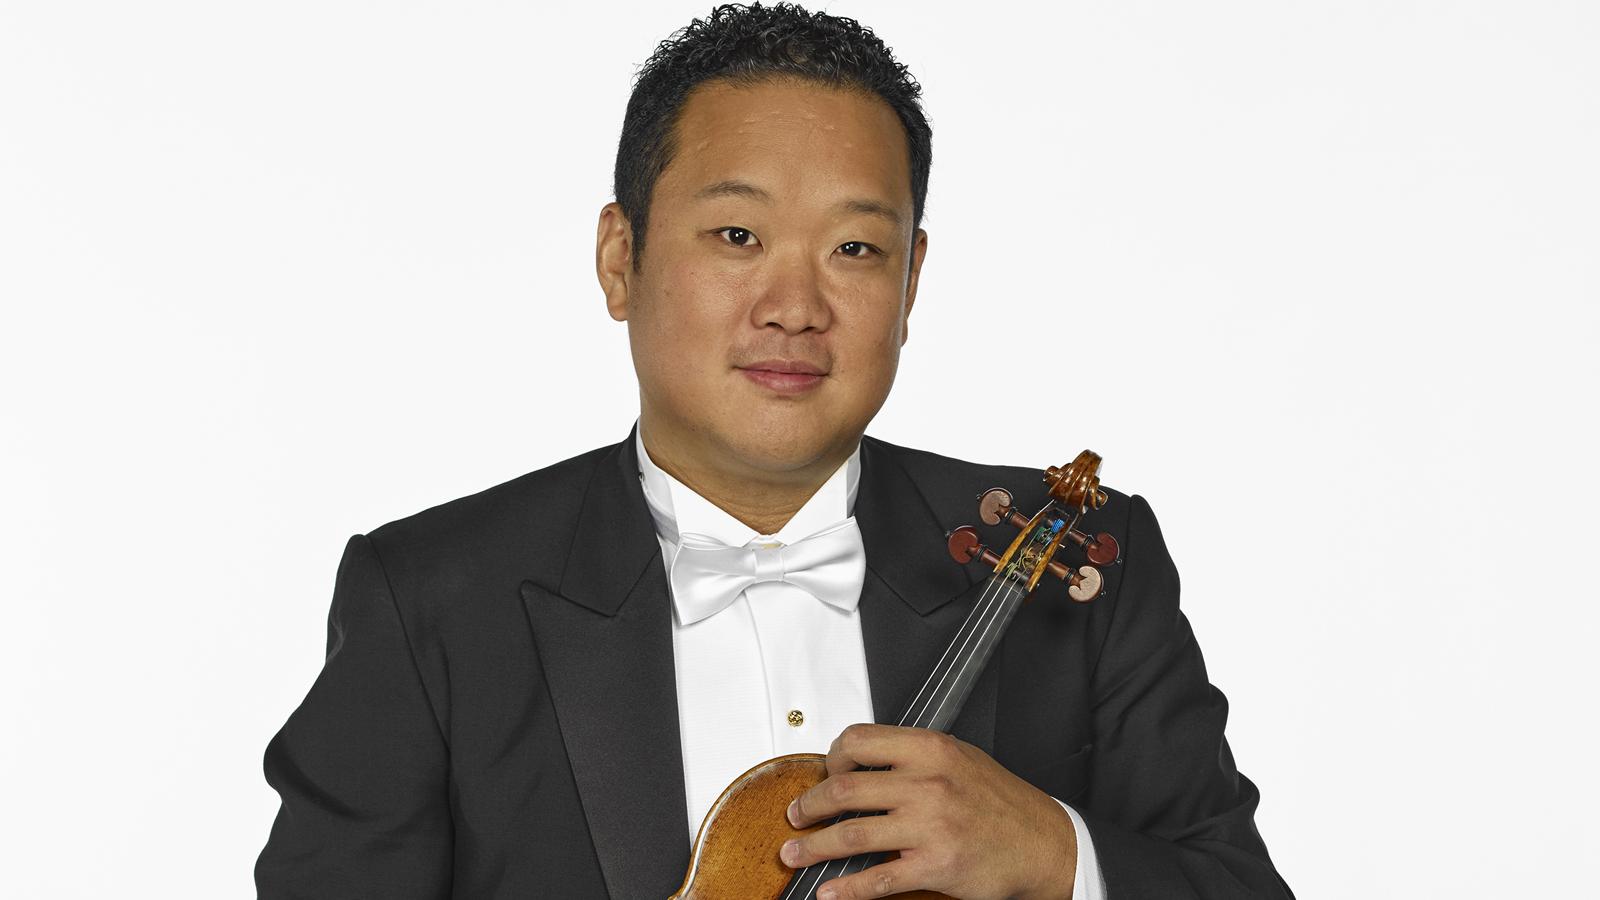 Buffalo Philharmonic Concertmaster Dennis Kim